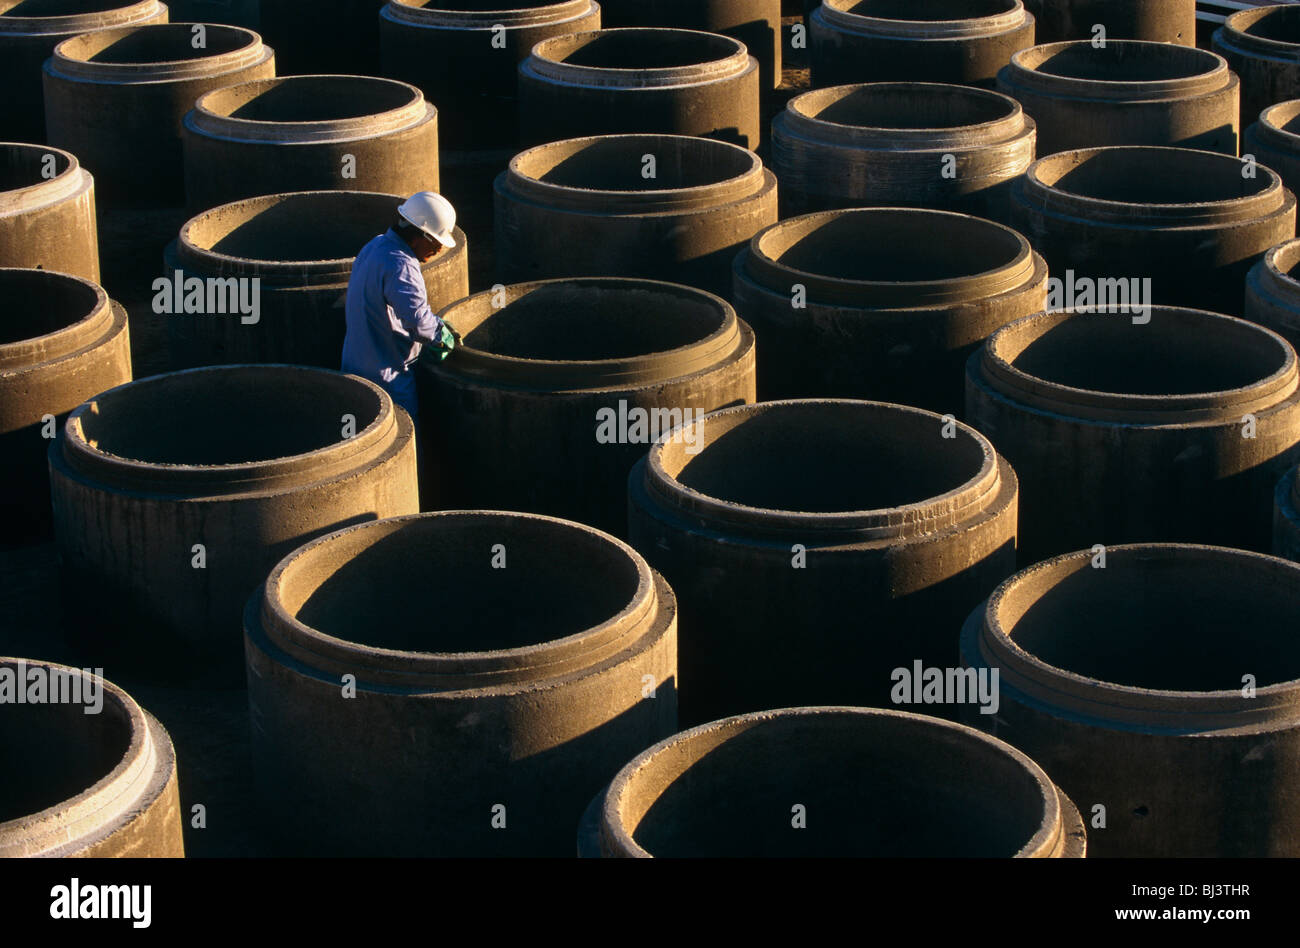 Precast concrete pipes are prepared for distribution by a